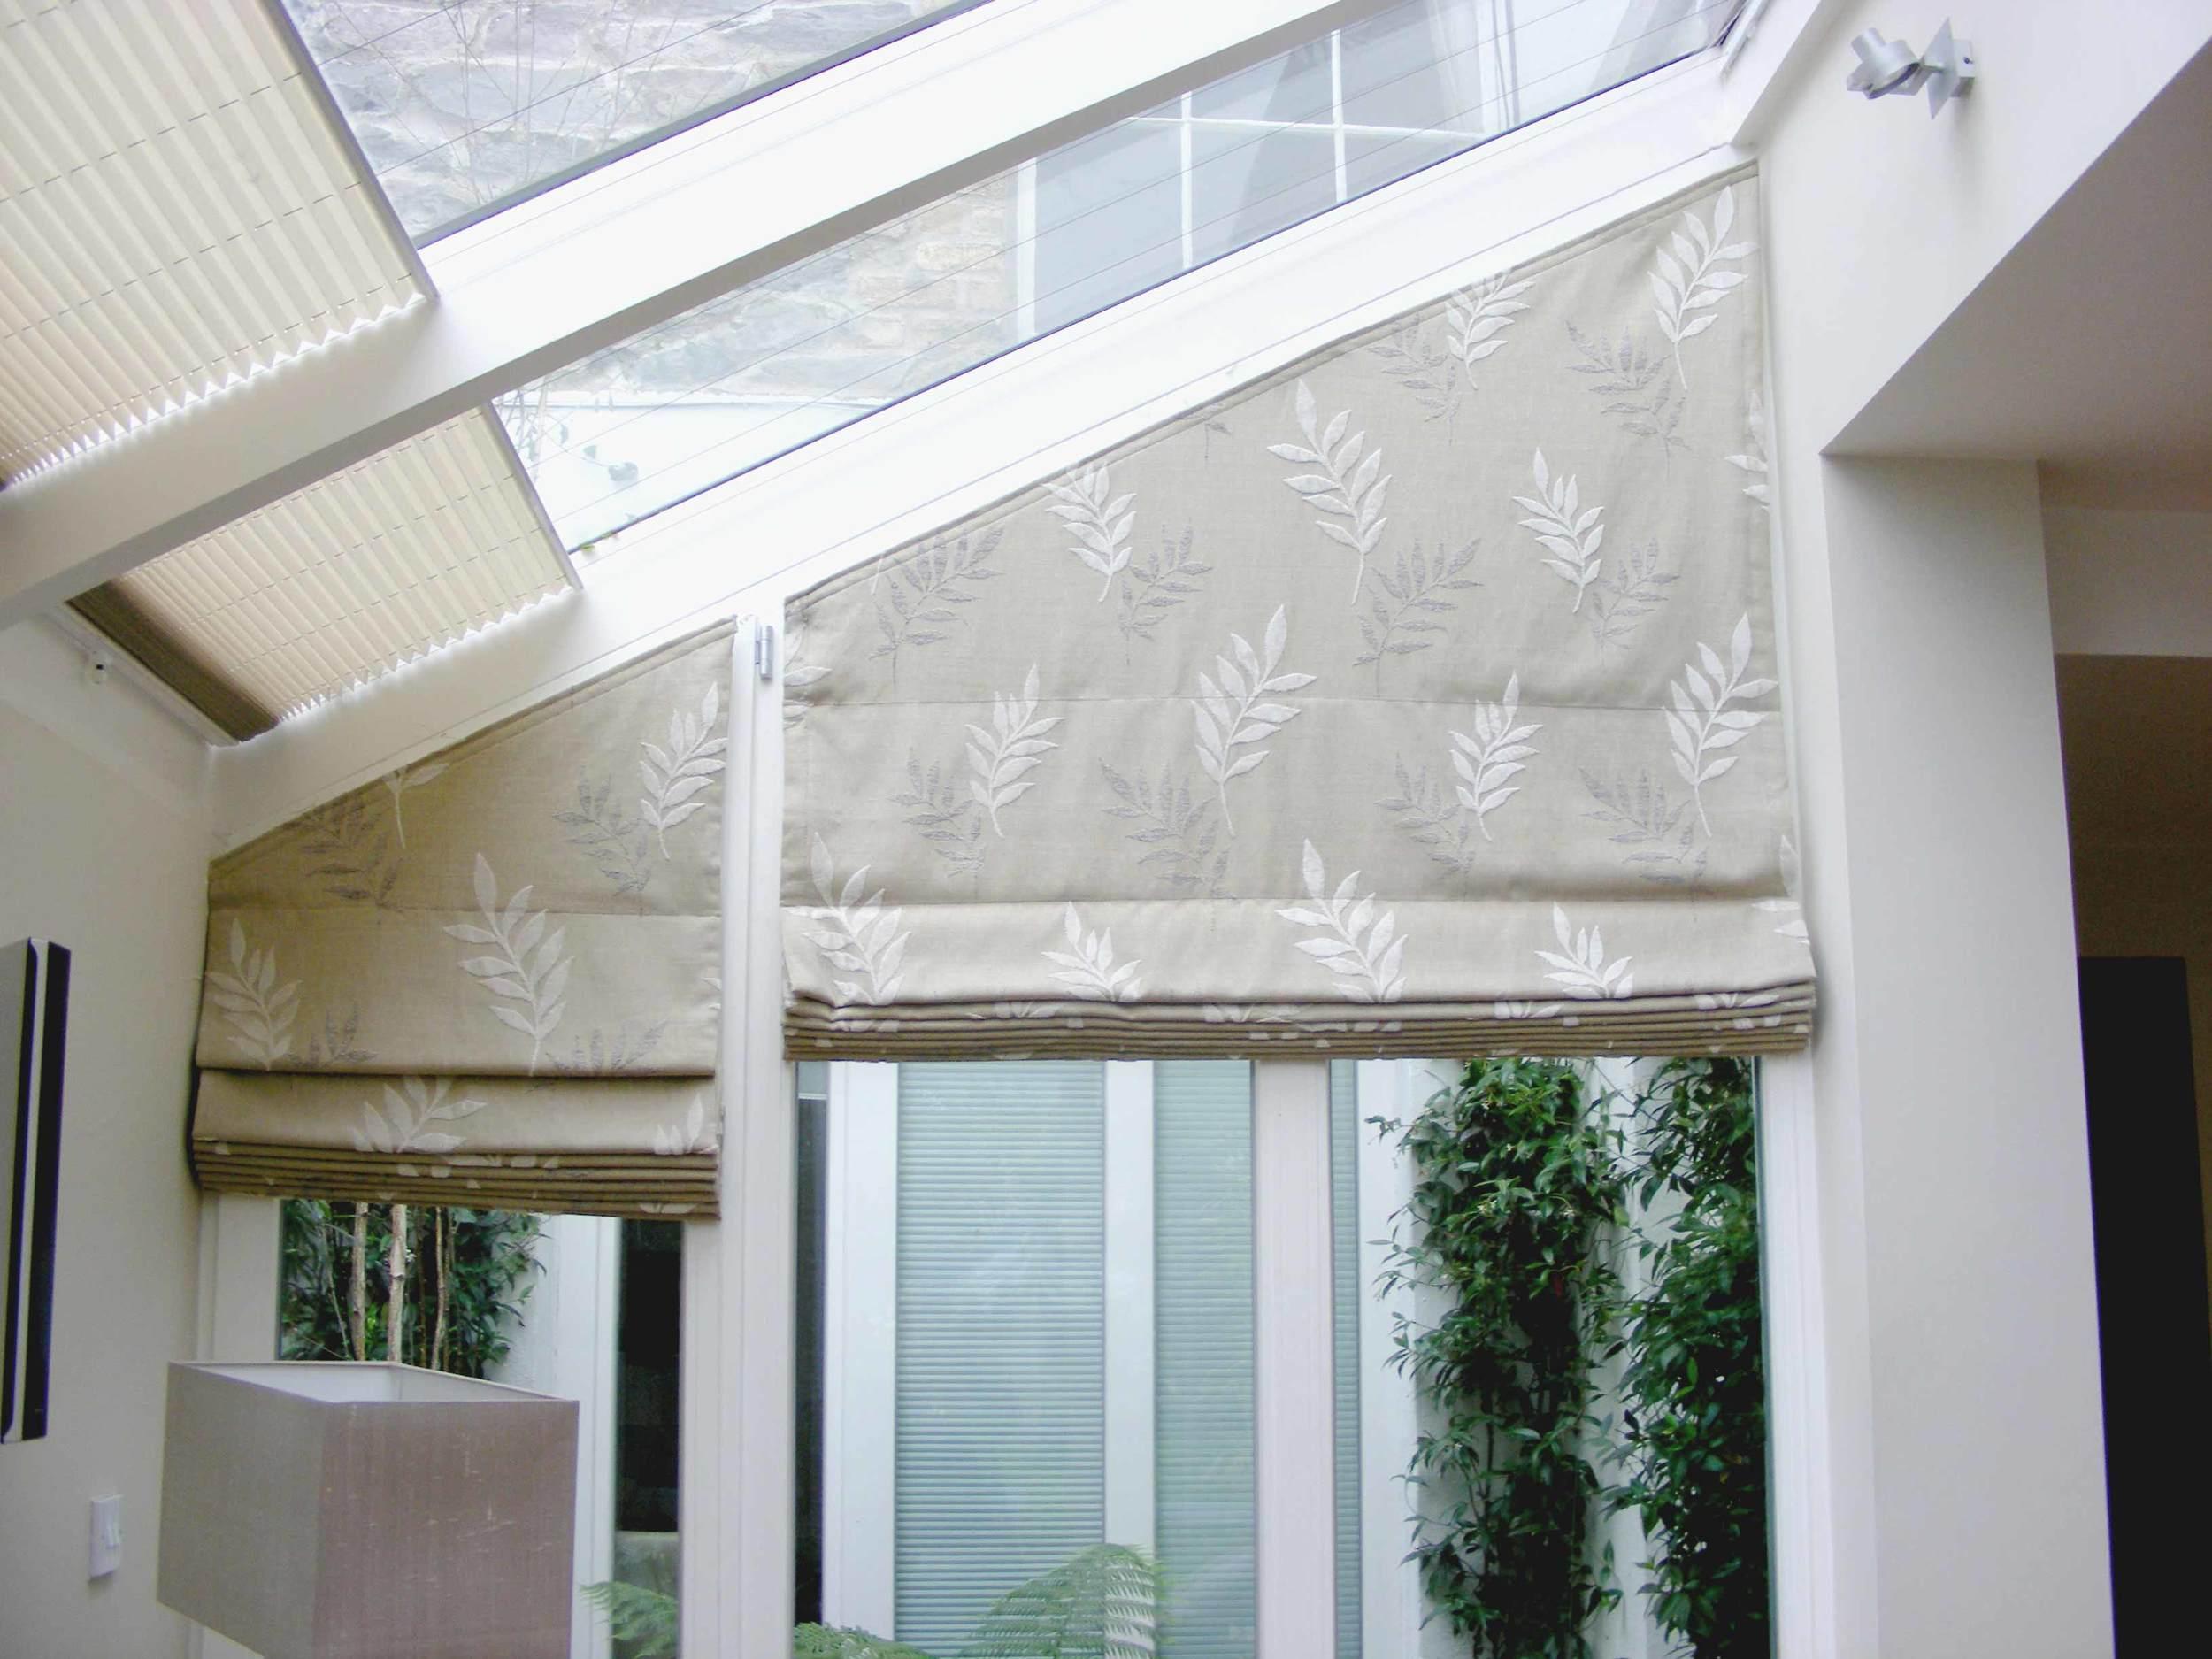 Roman-Blind-on-angled-window-web(1).jpg